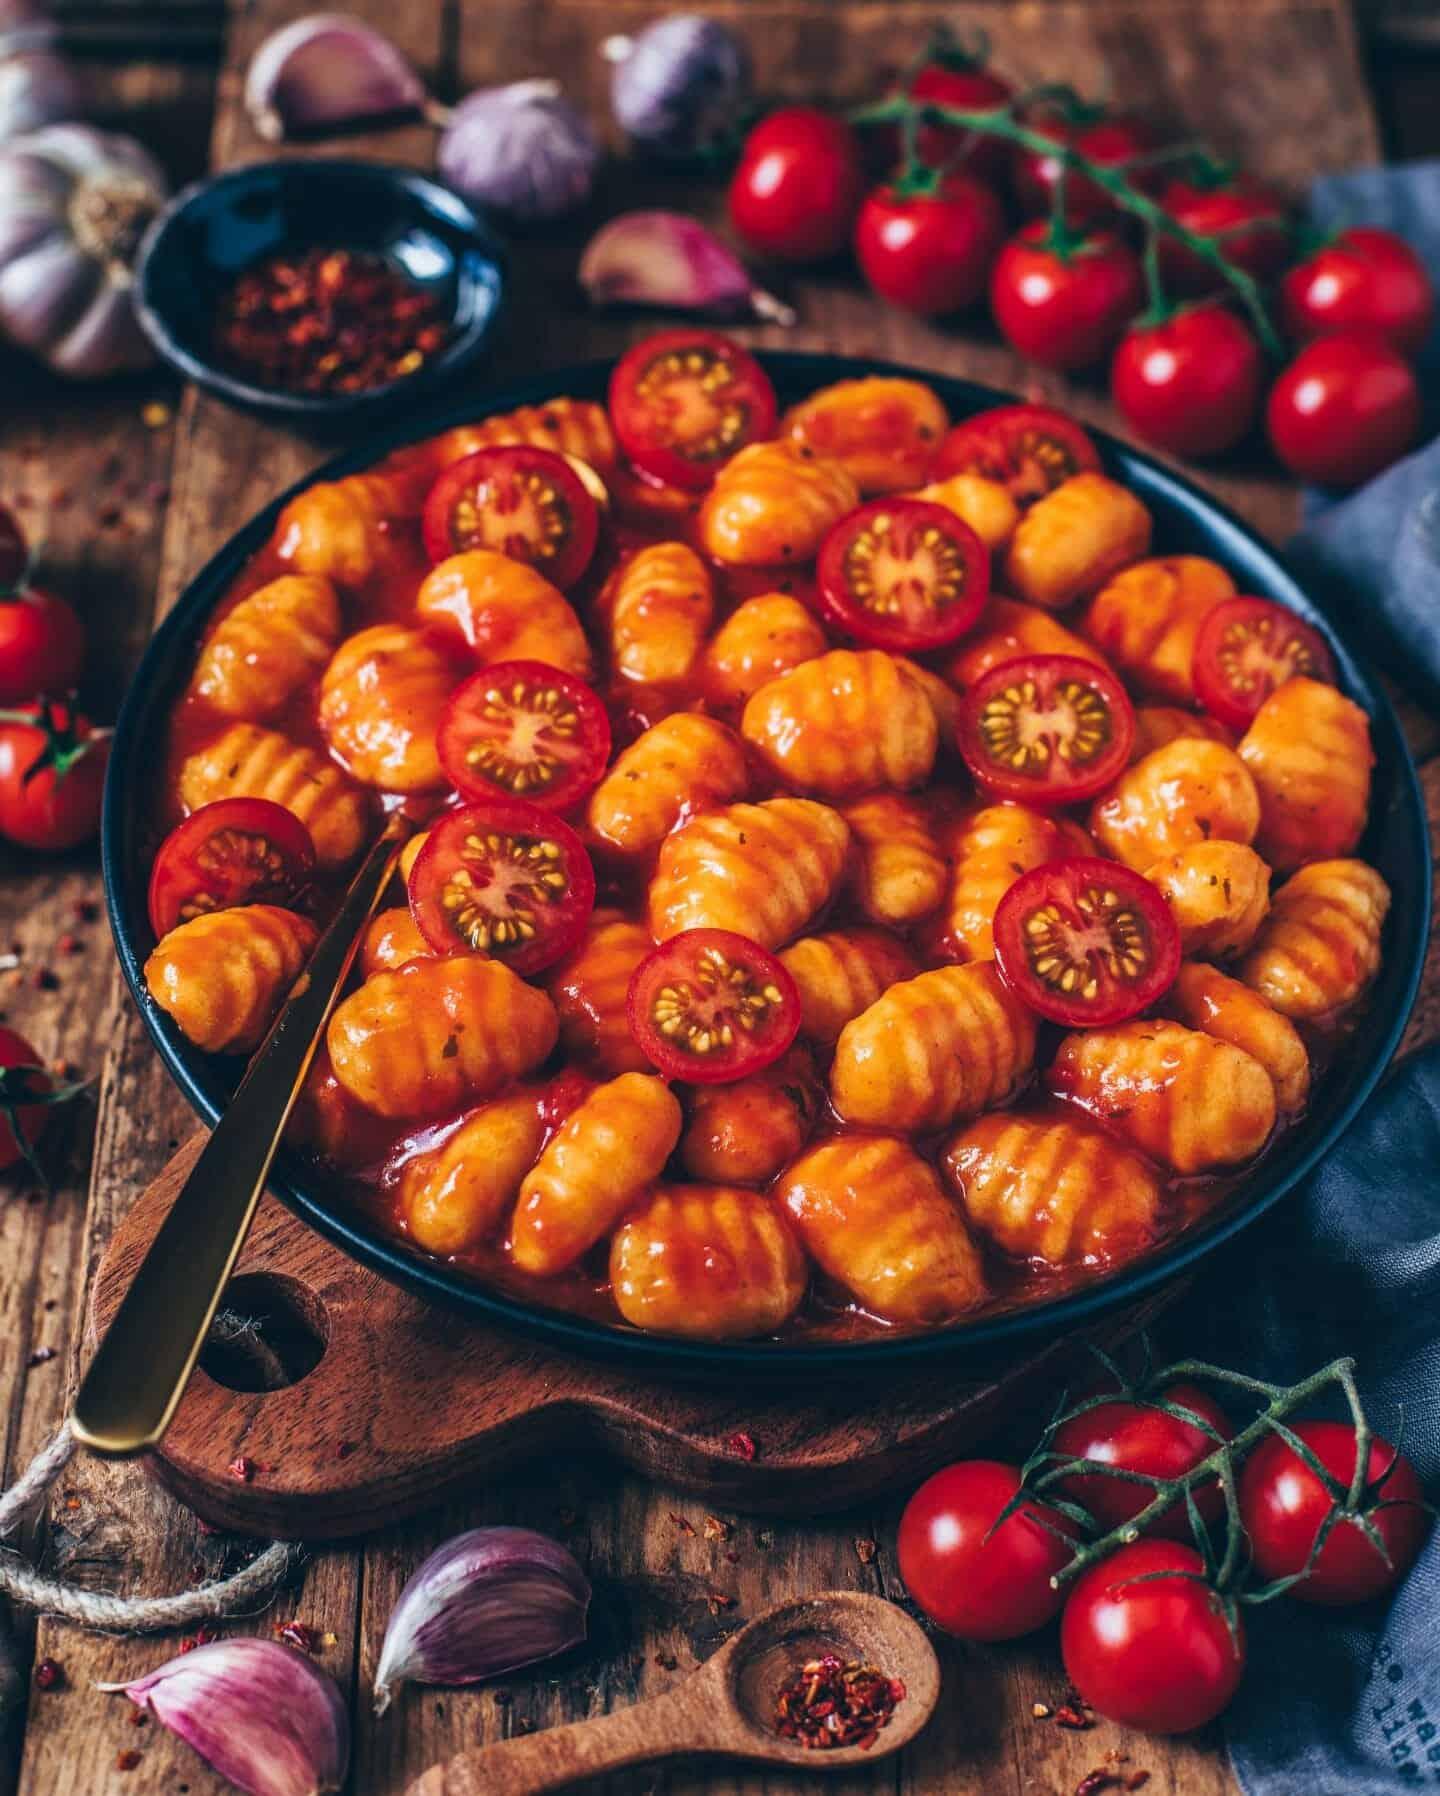 gnocchi tomato sauce